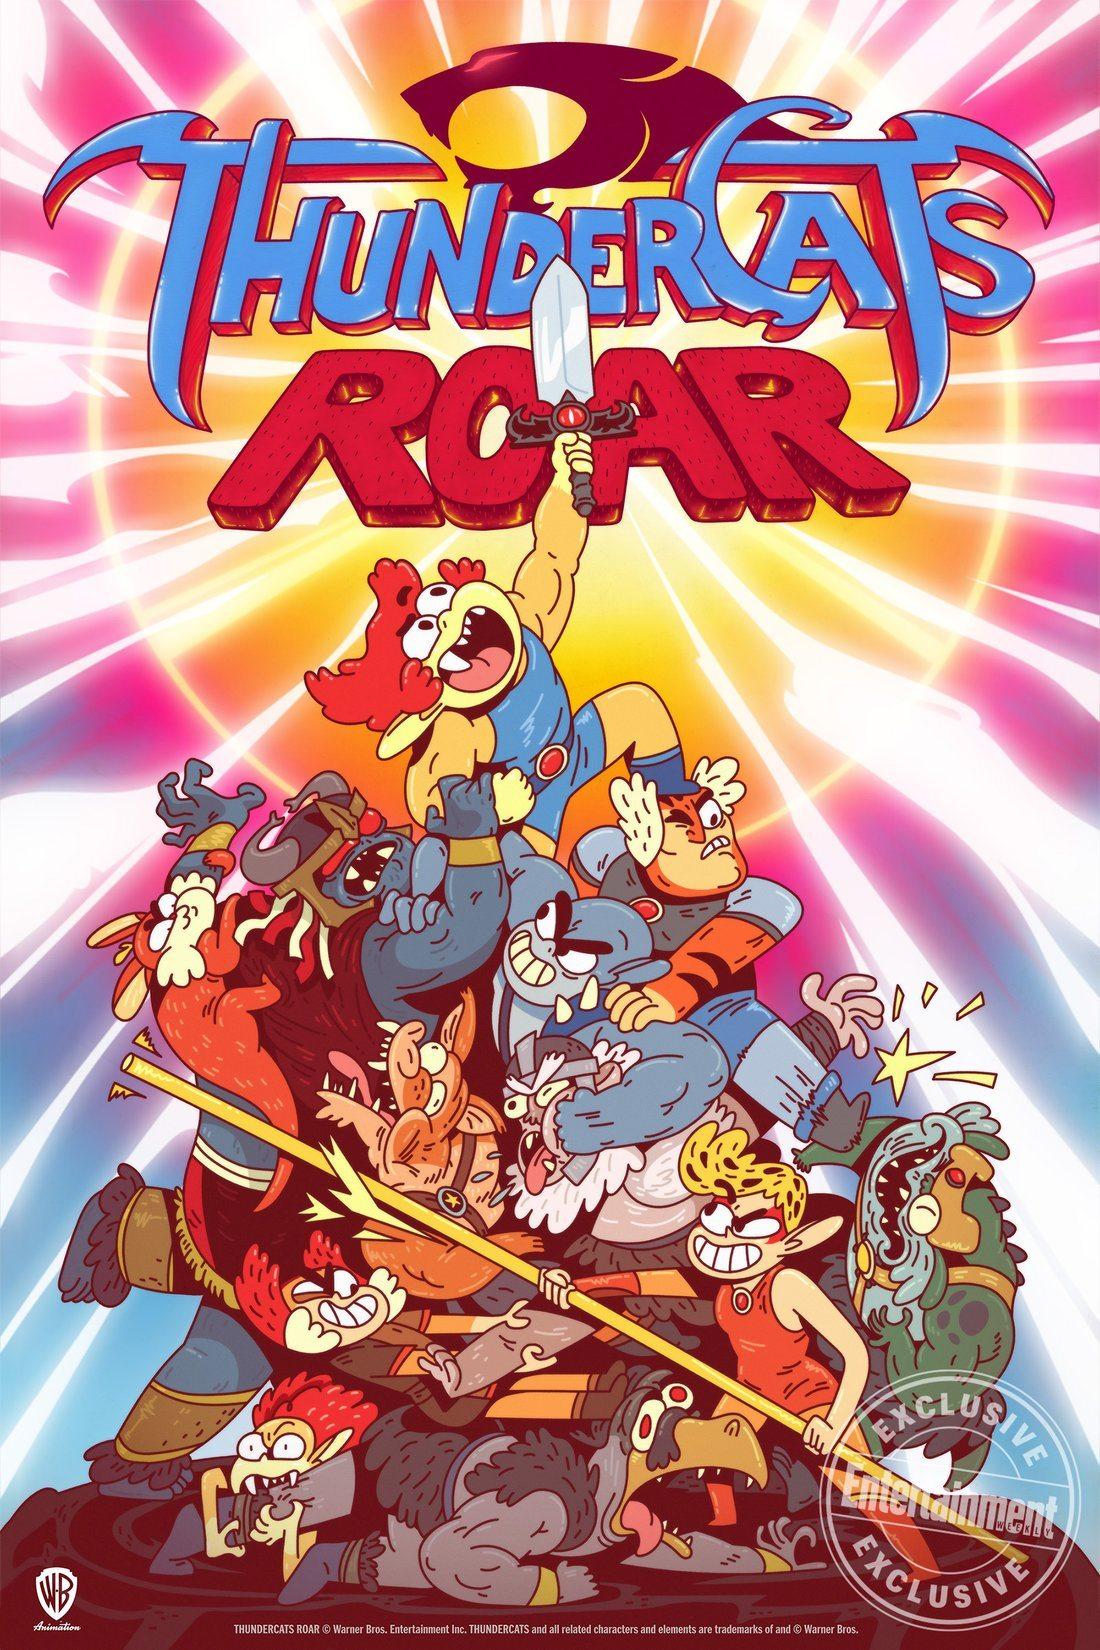 ThunderCats regresa con la nueva serie de comedia animada ThunderCats Roar